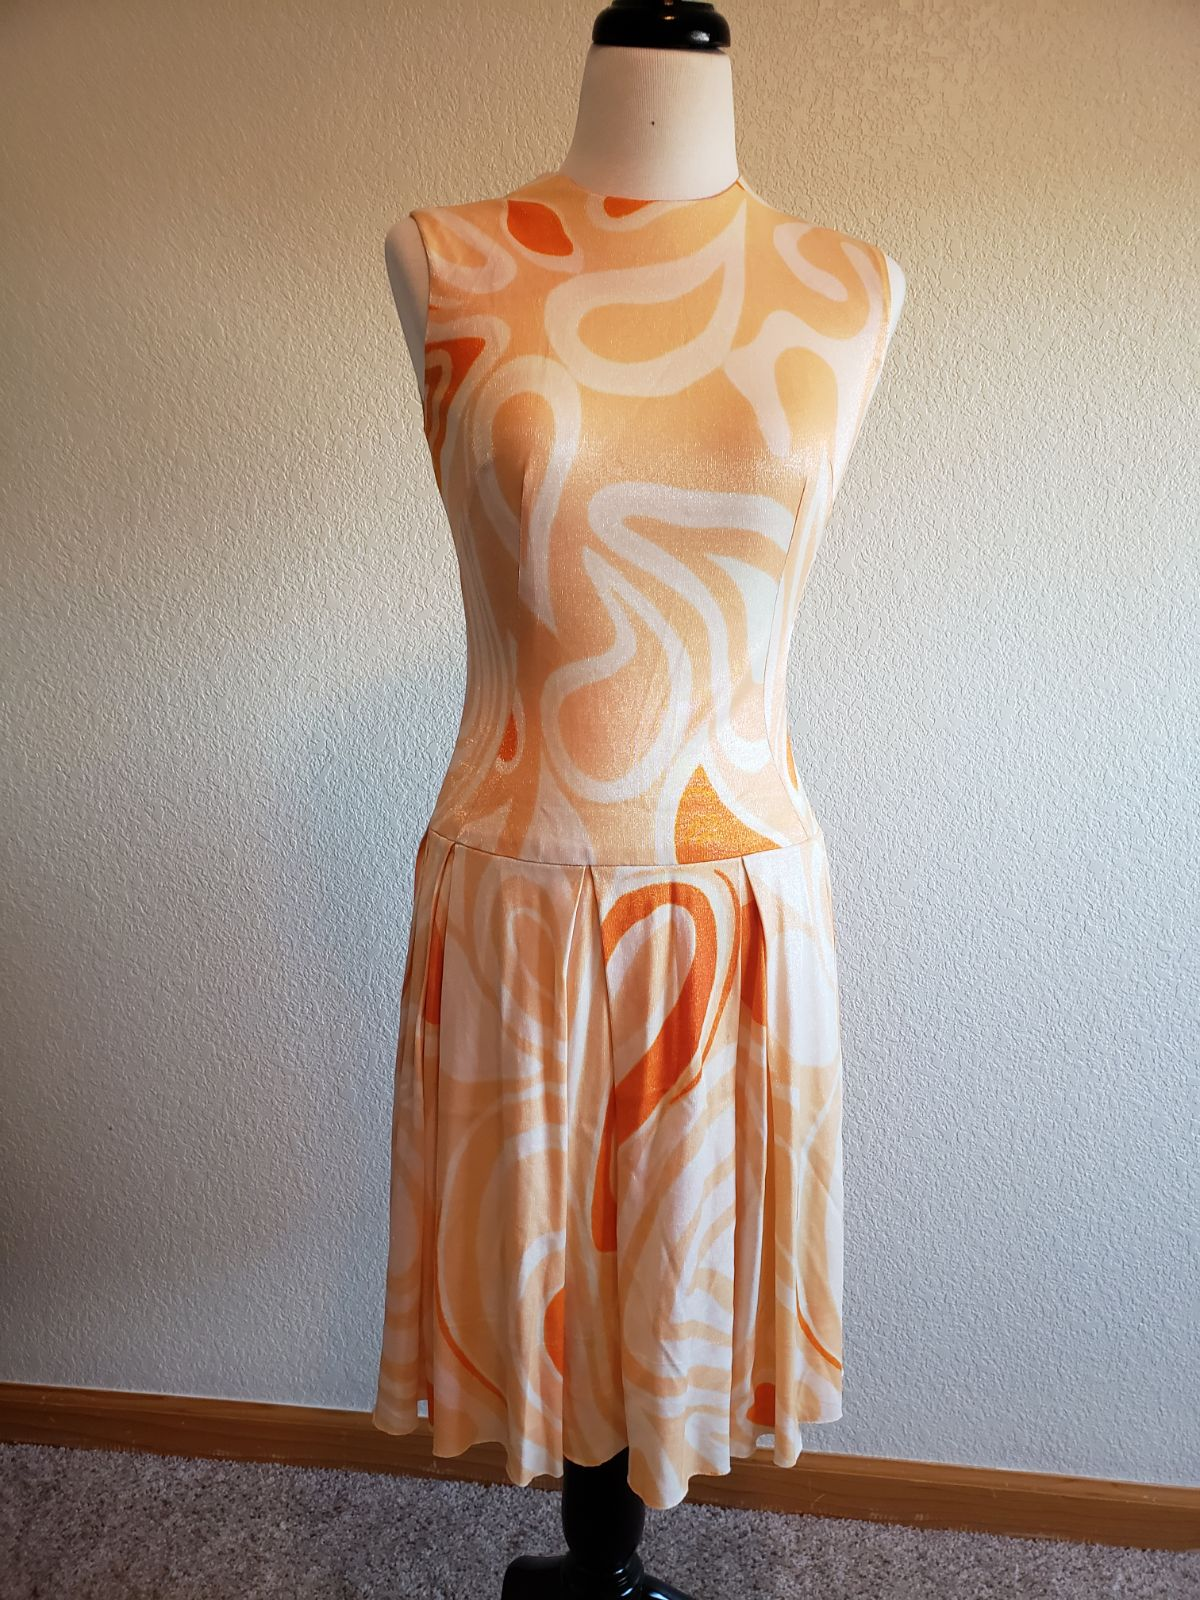 1960s drop waist psychedelic mod dress